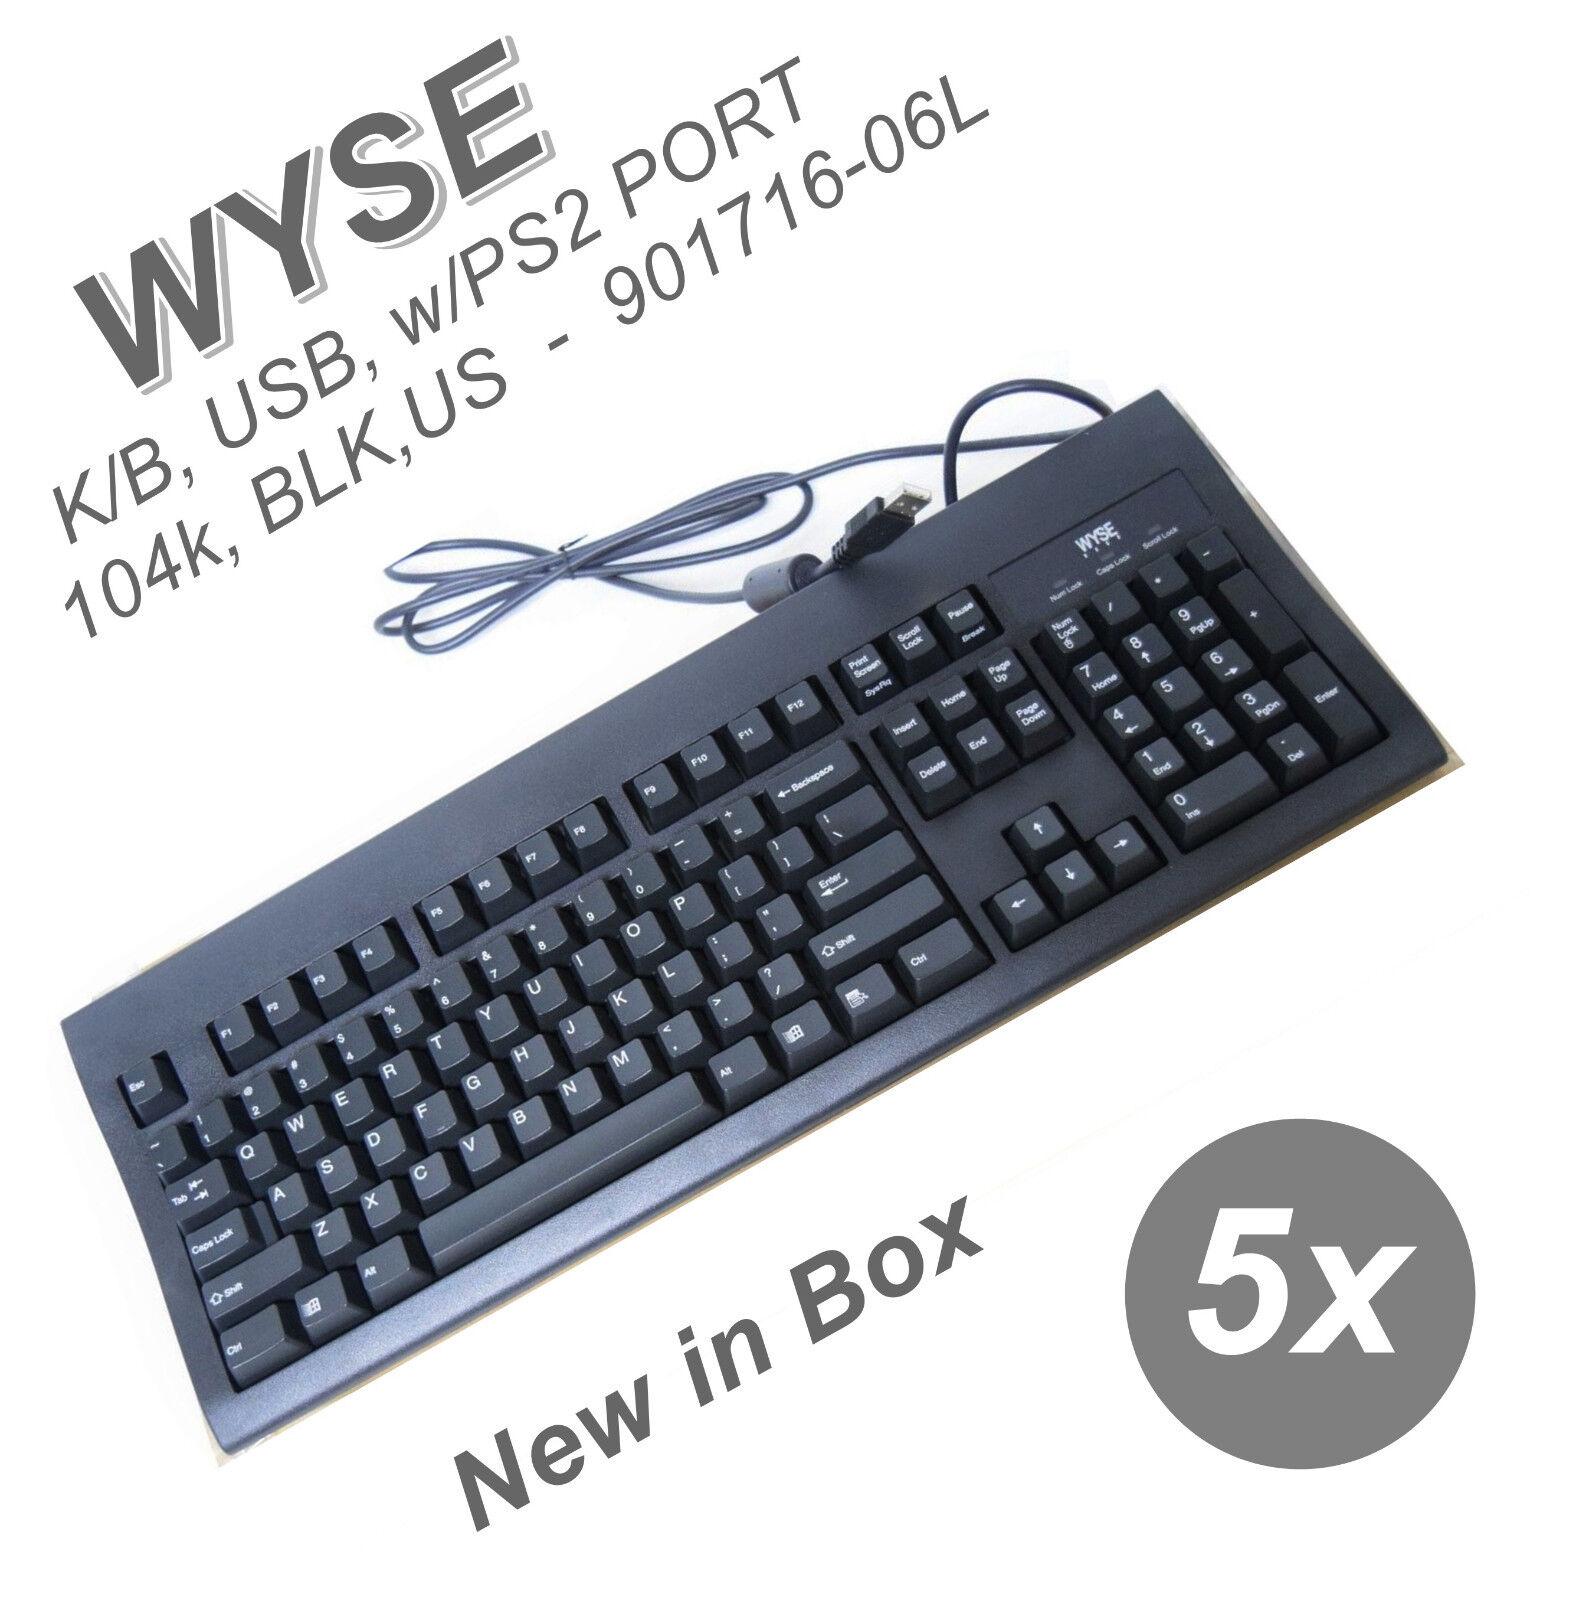 Black USB Keyboard for Windows 901716-06 Ku-8933